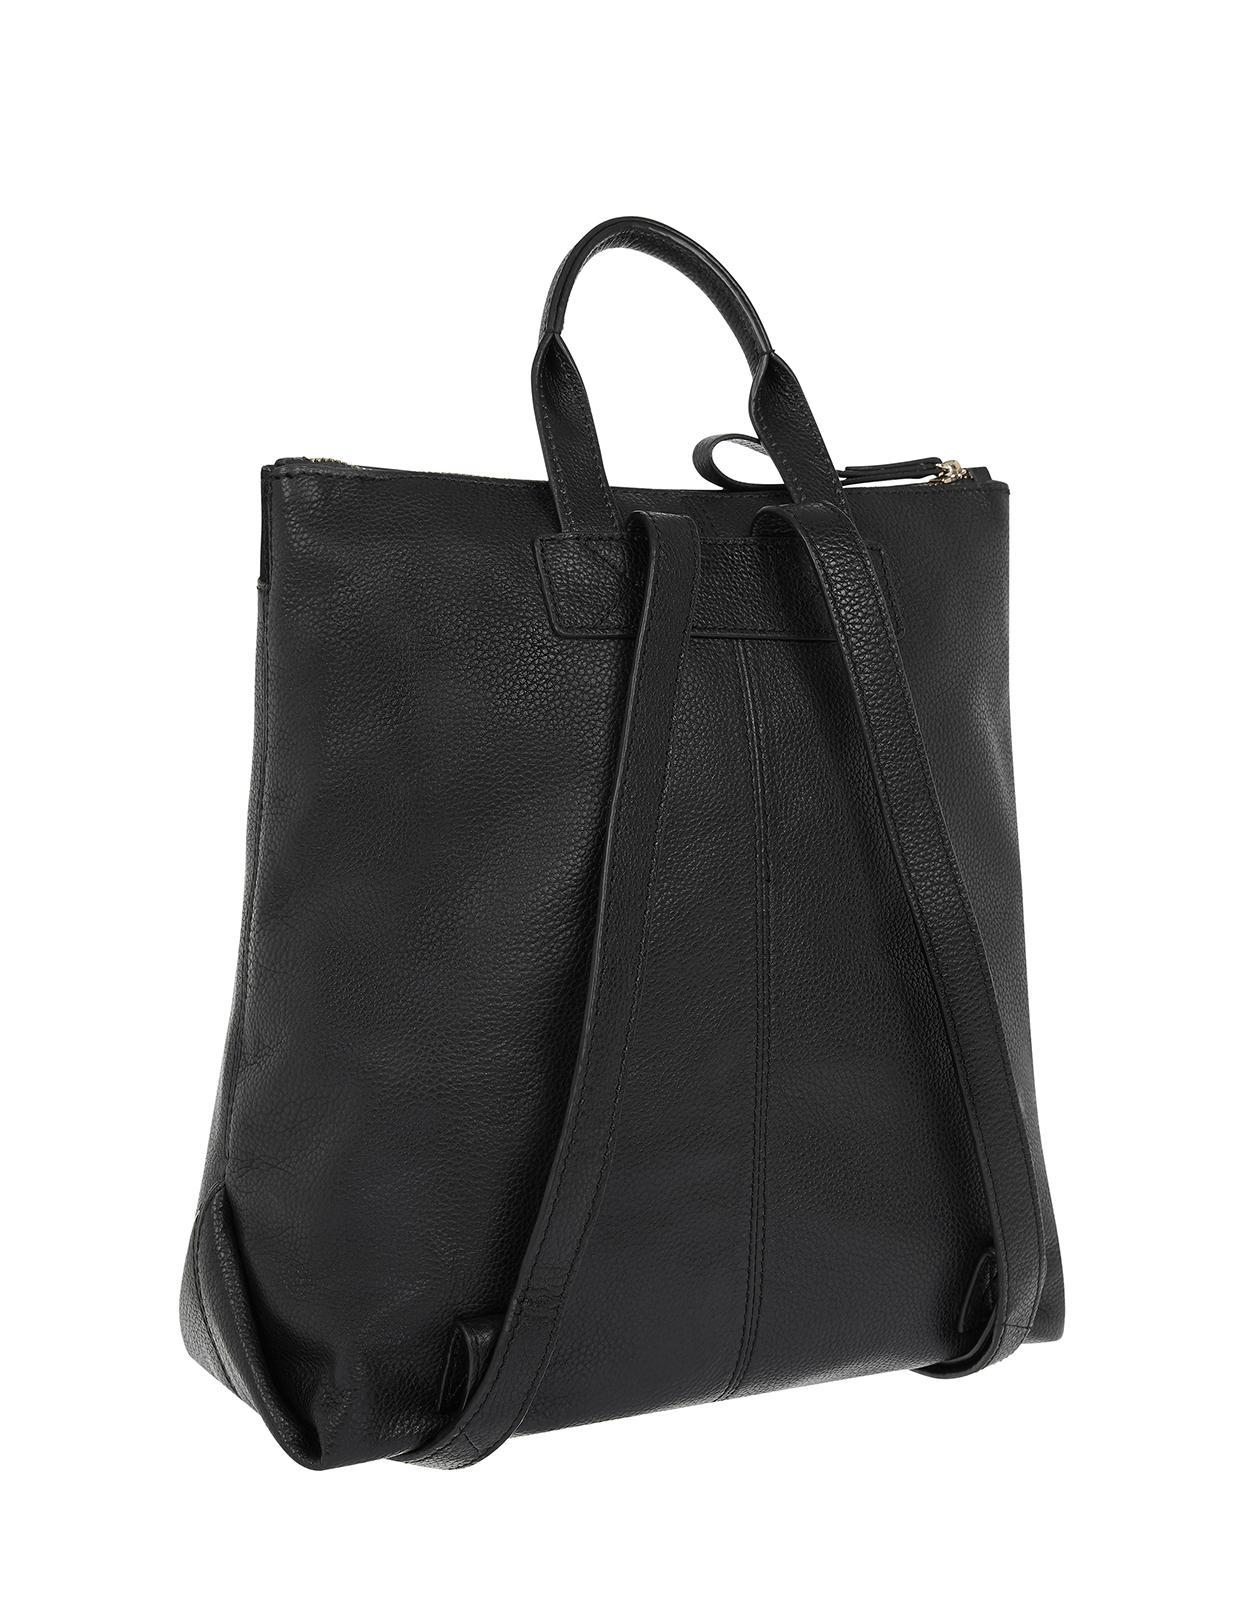 8753f835e7e2 Accessorize Ashton Ziptop Leather Backpack in Black - Lyst